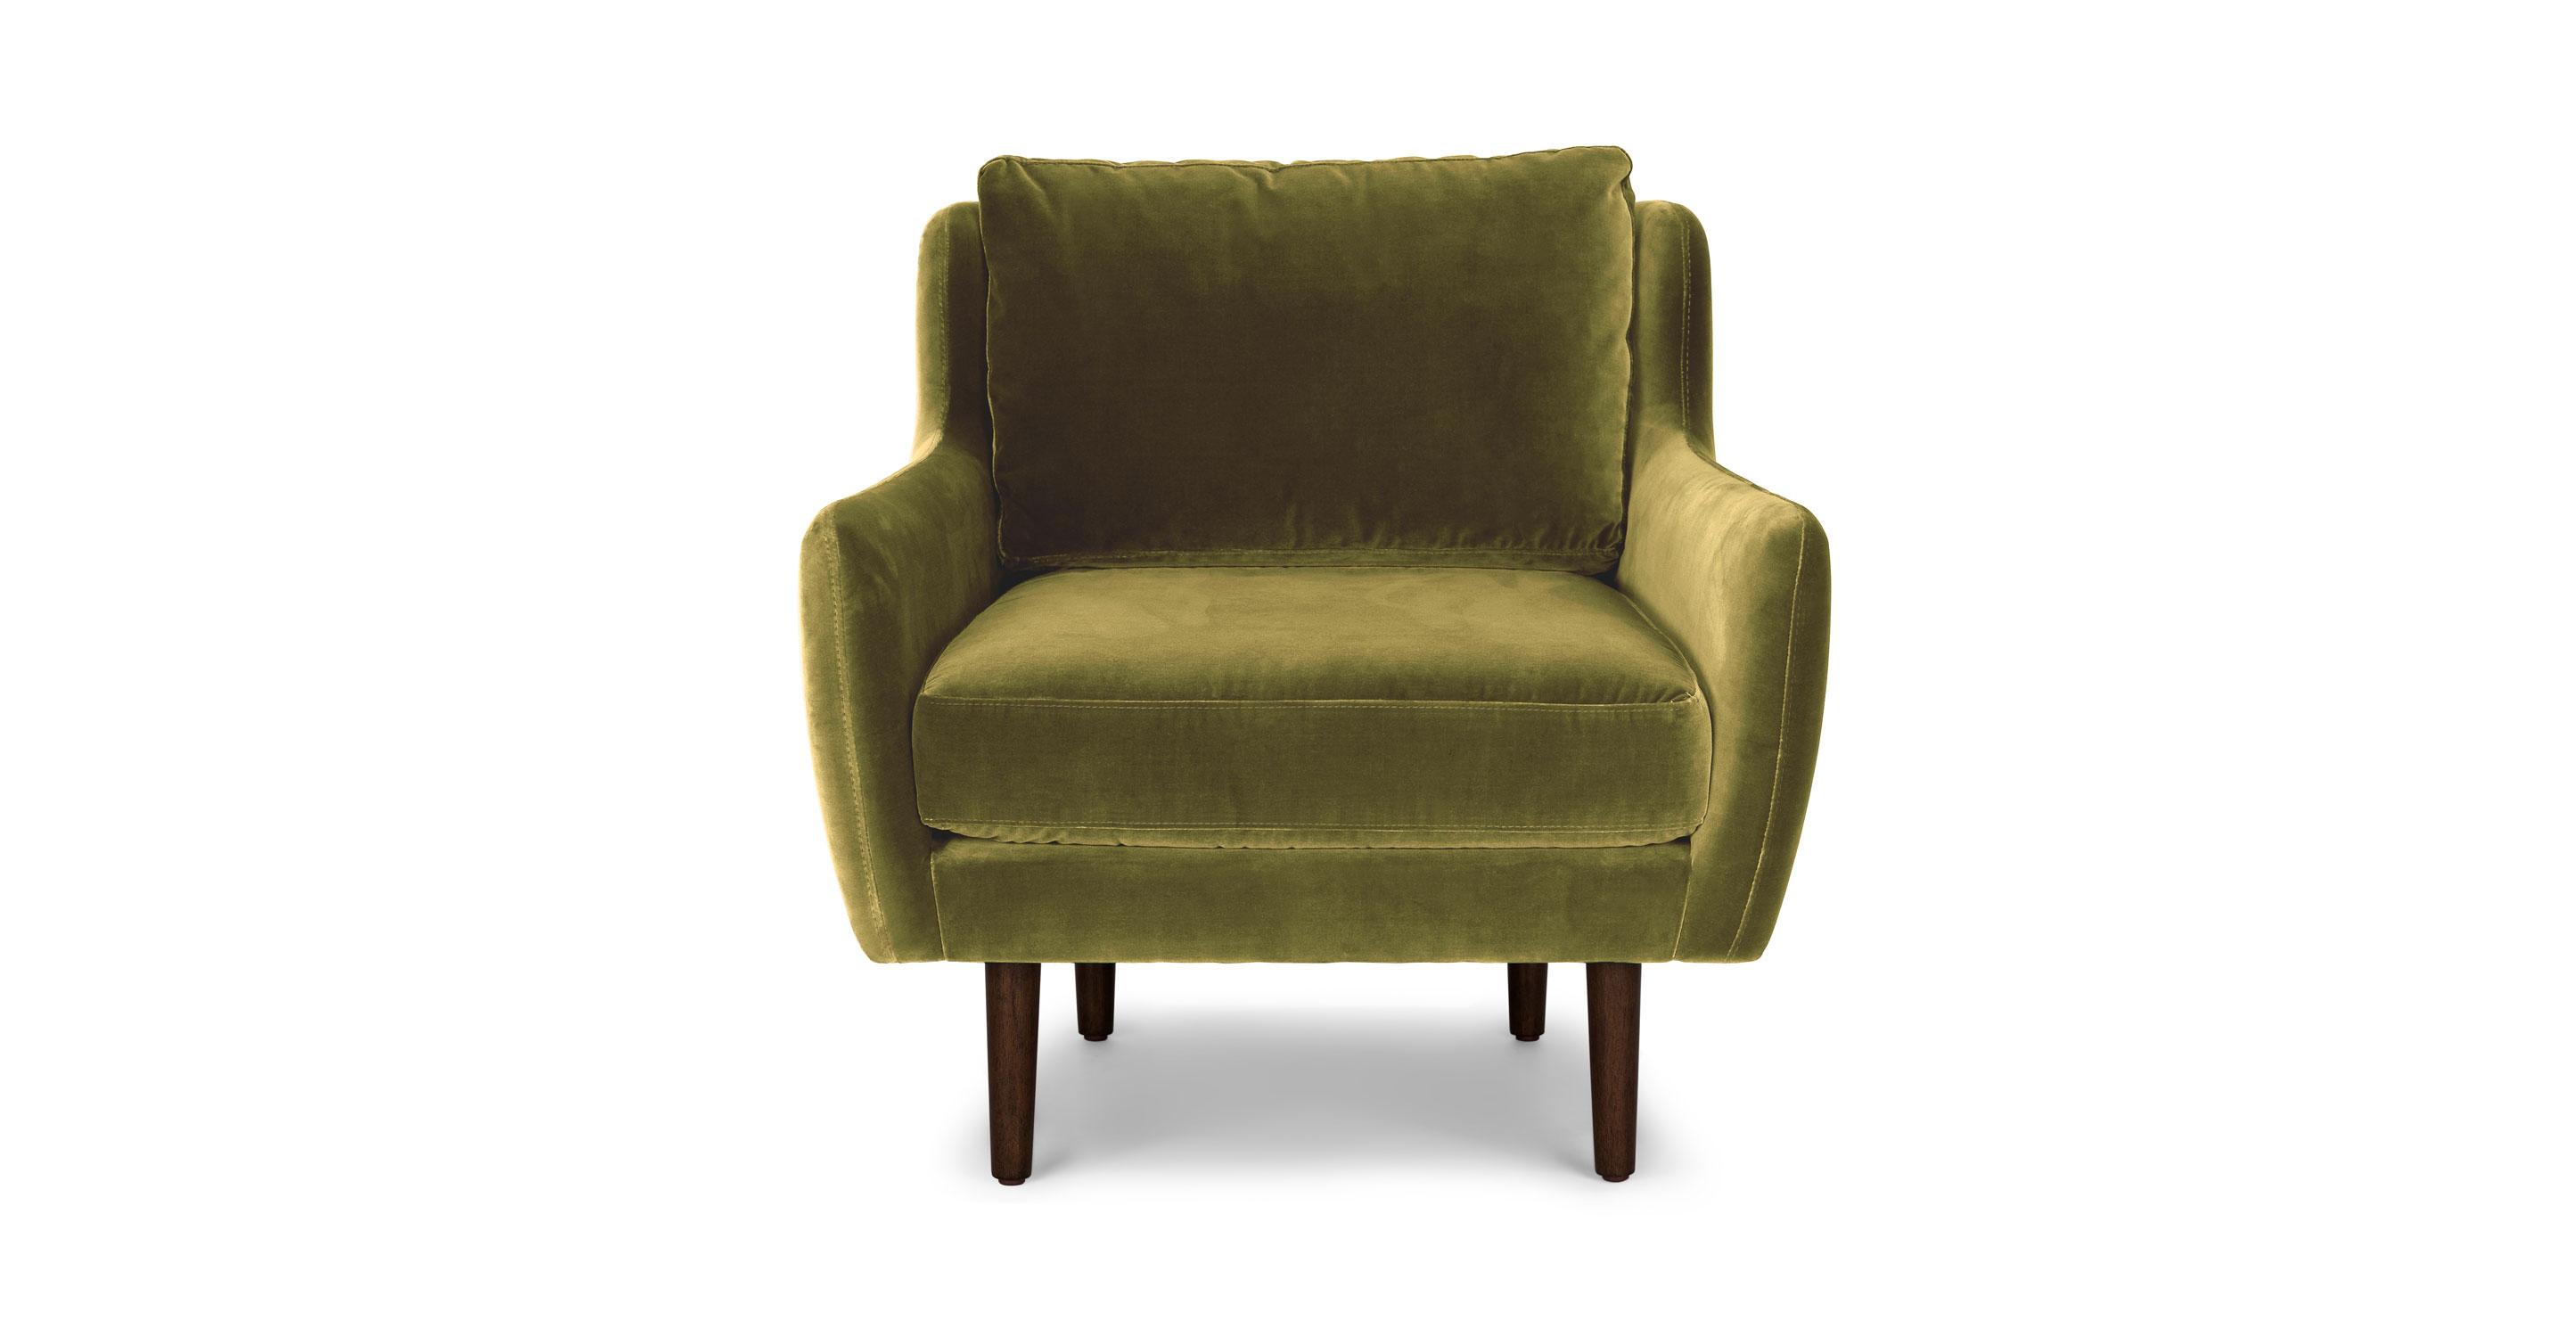 olive green velvet accent chair stressless chairs john lewis matrix article